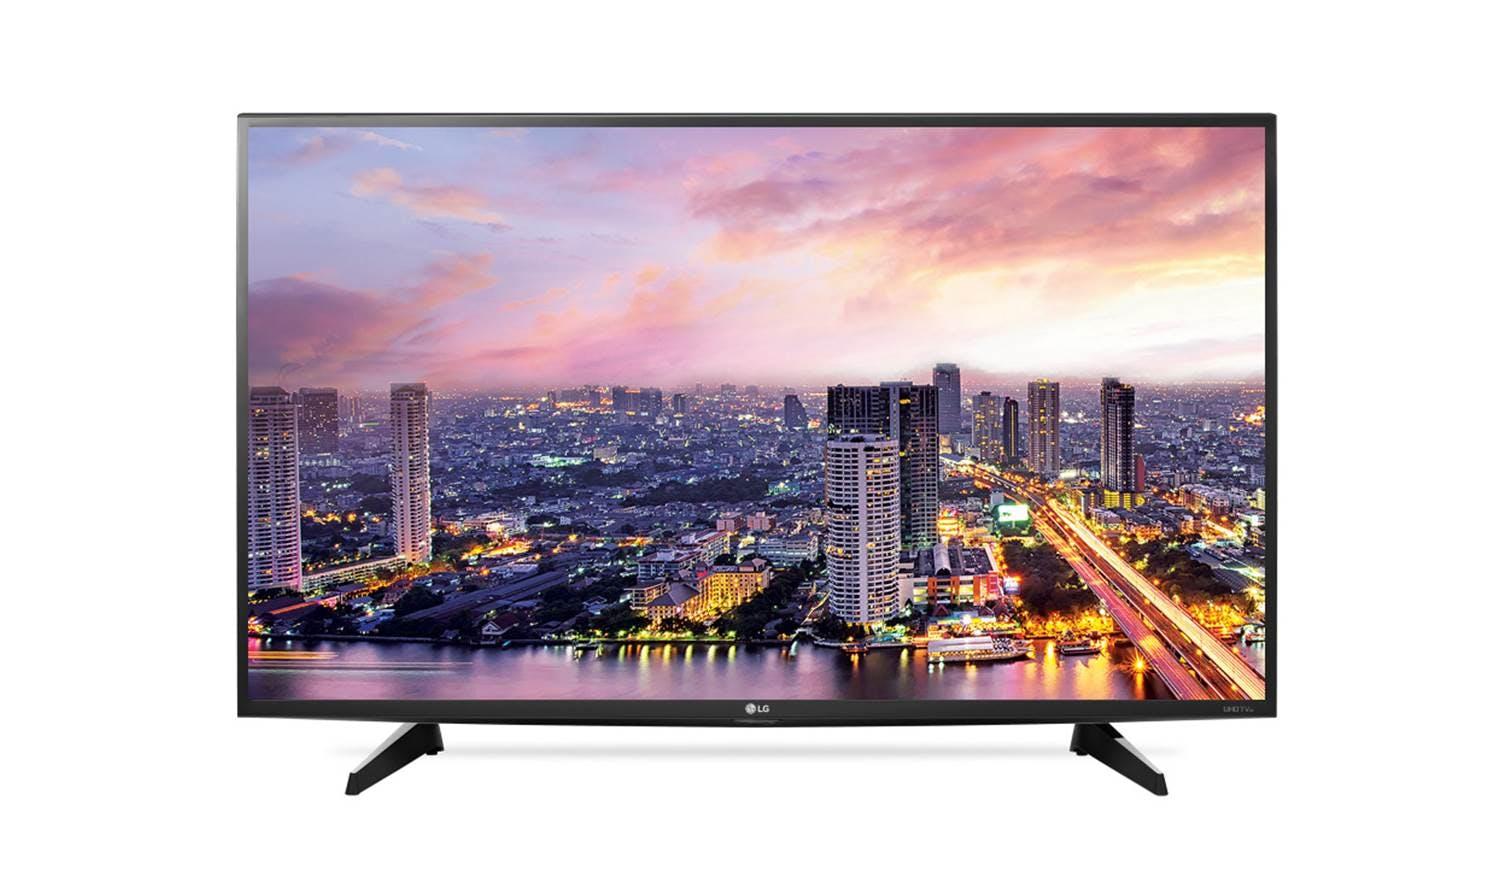 TV, Smart TV, LED TV, 4K TV – Samsung TV, Sony TV, LG Smart TV ...